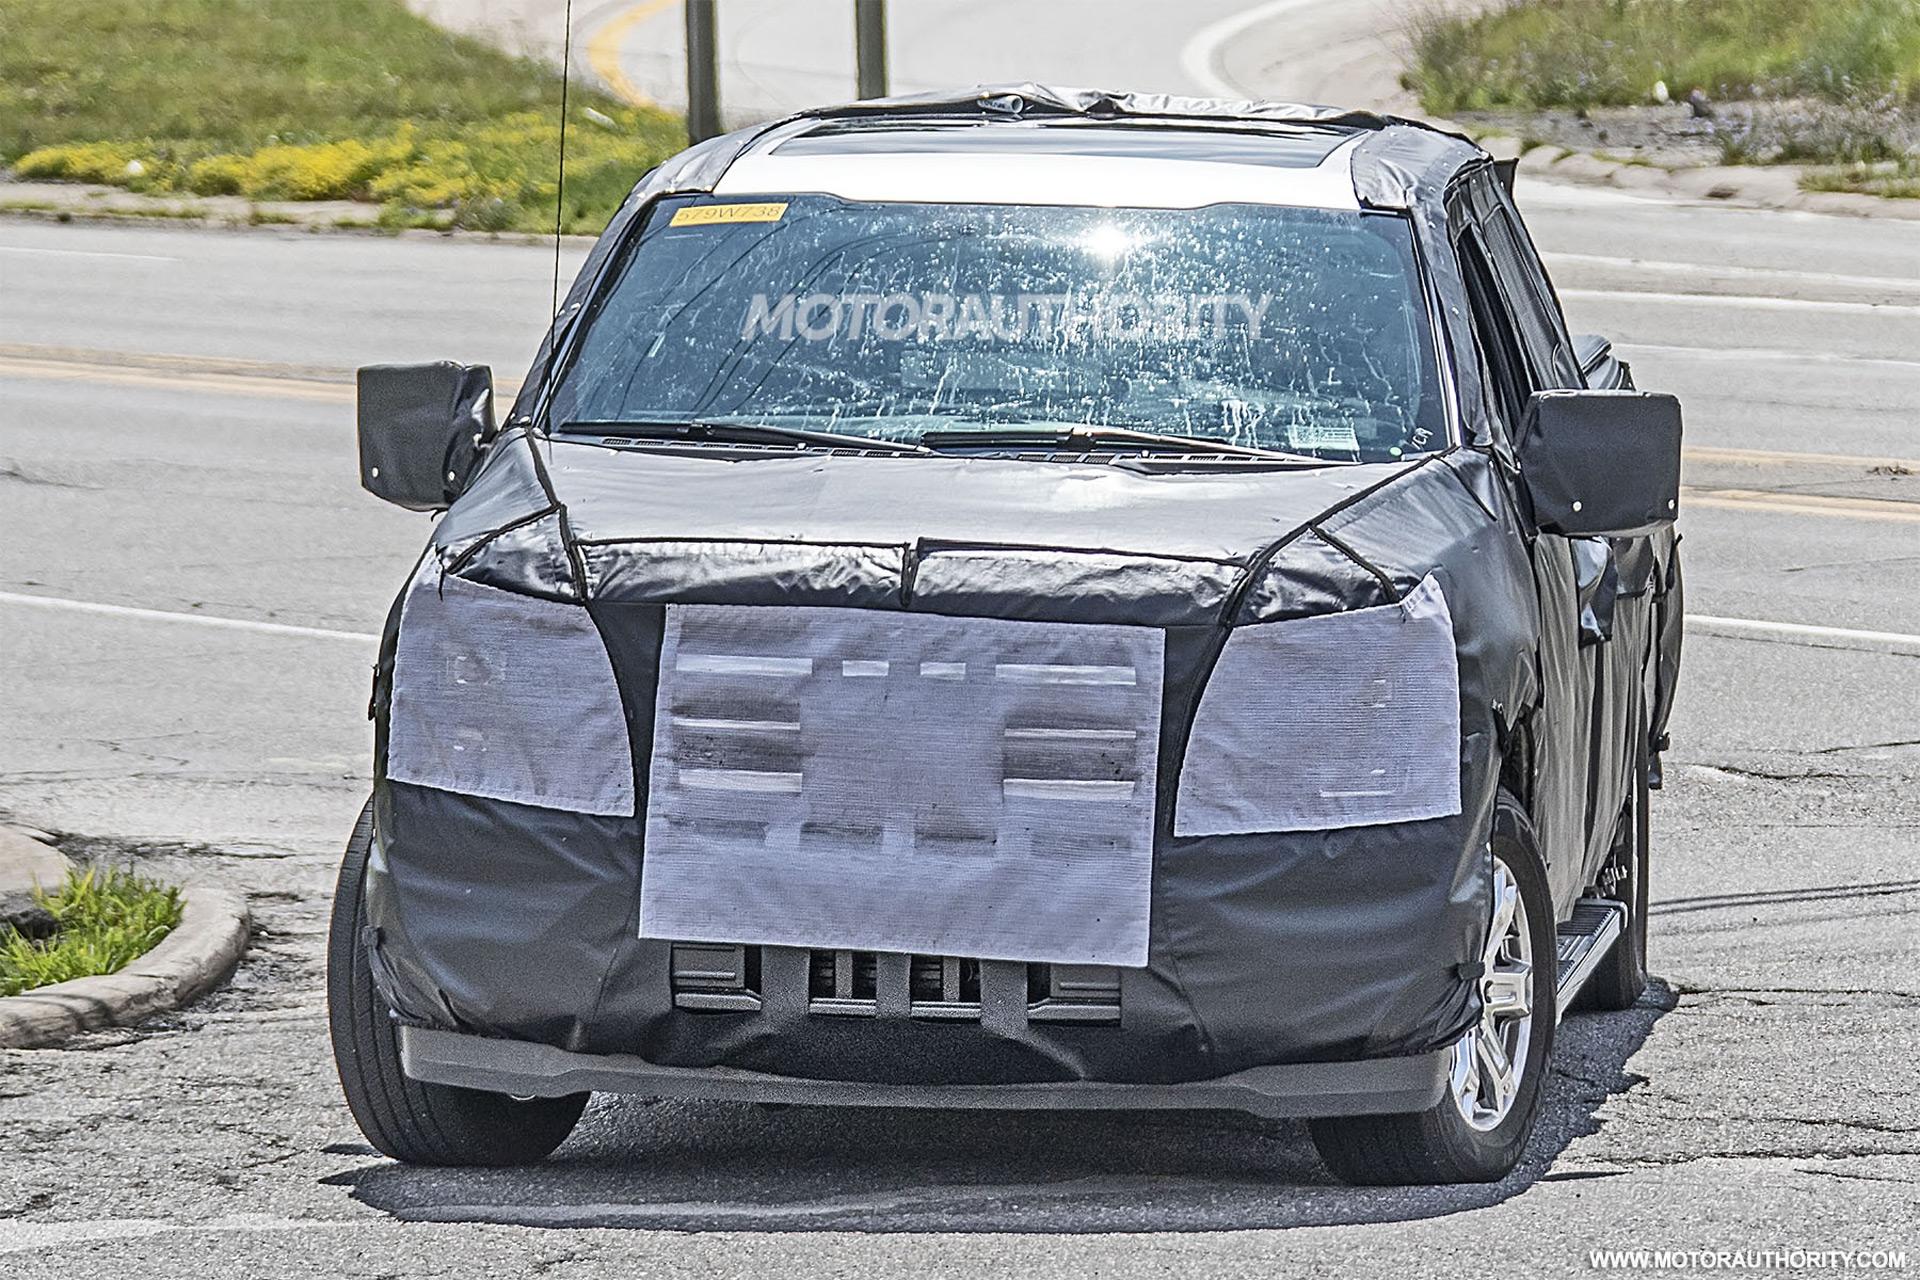 2020 - [Ford] F-Series 2021-ford-f-150-spy-shots--image-via-s-baldauf-sb-medien_100710856_h